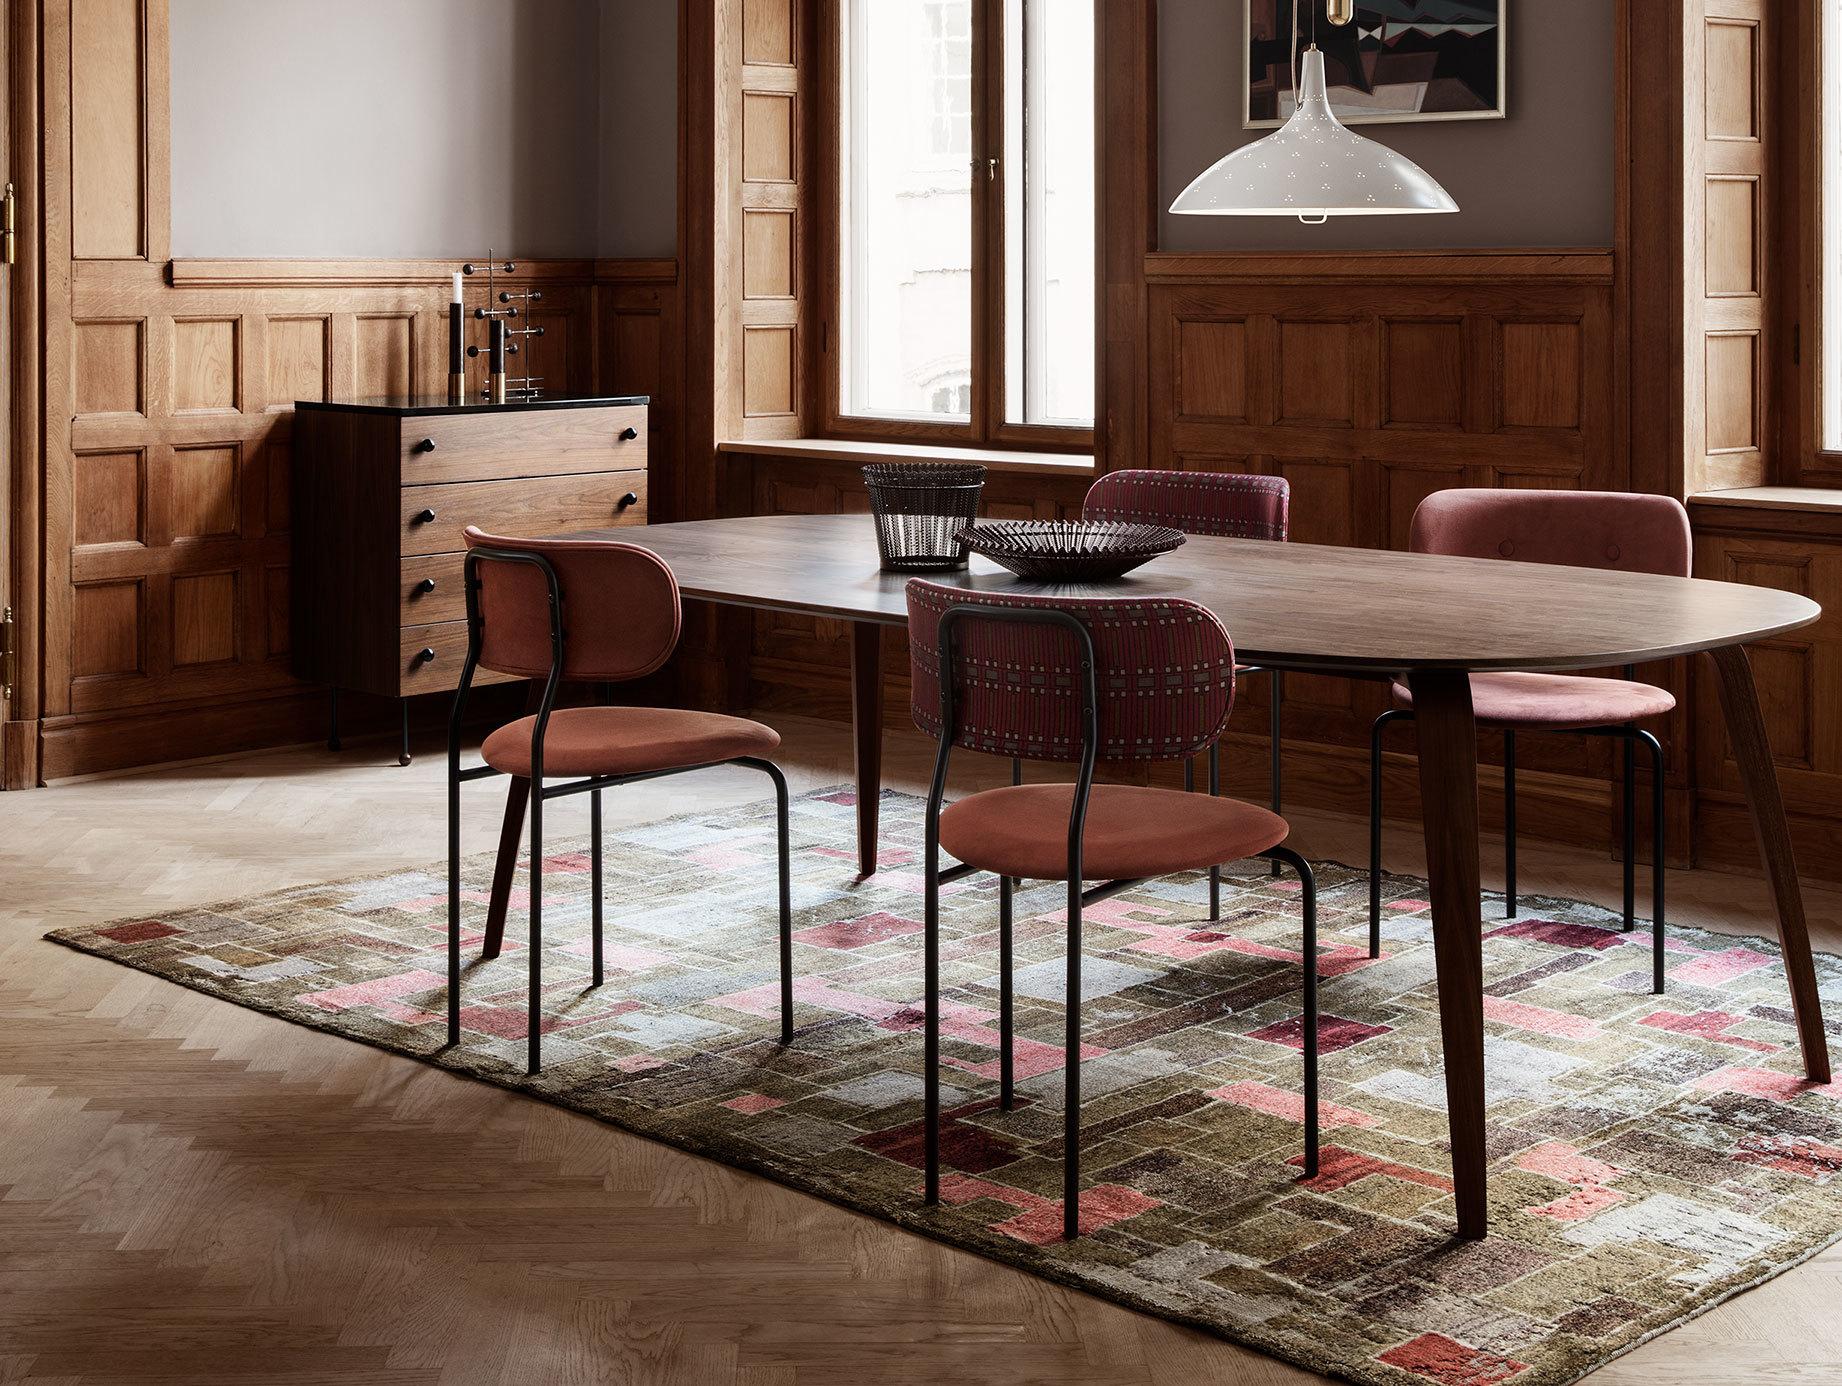 Gubi Coco Dining Chairs Oeo Studio